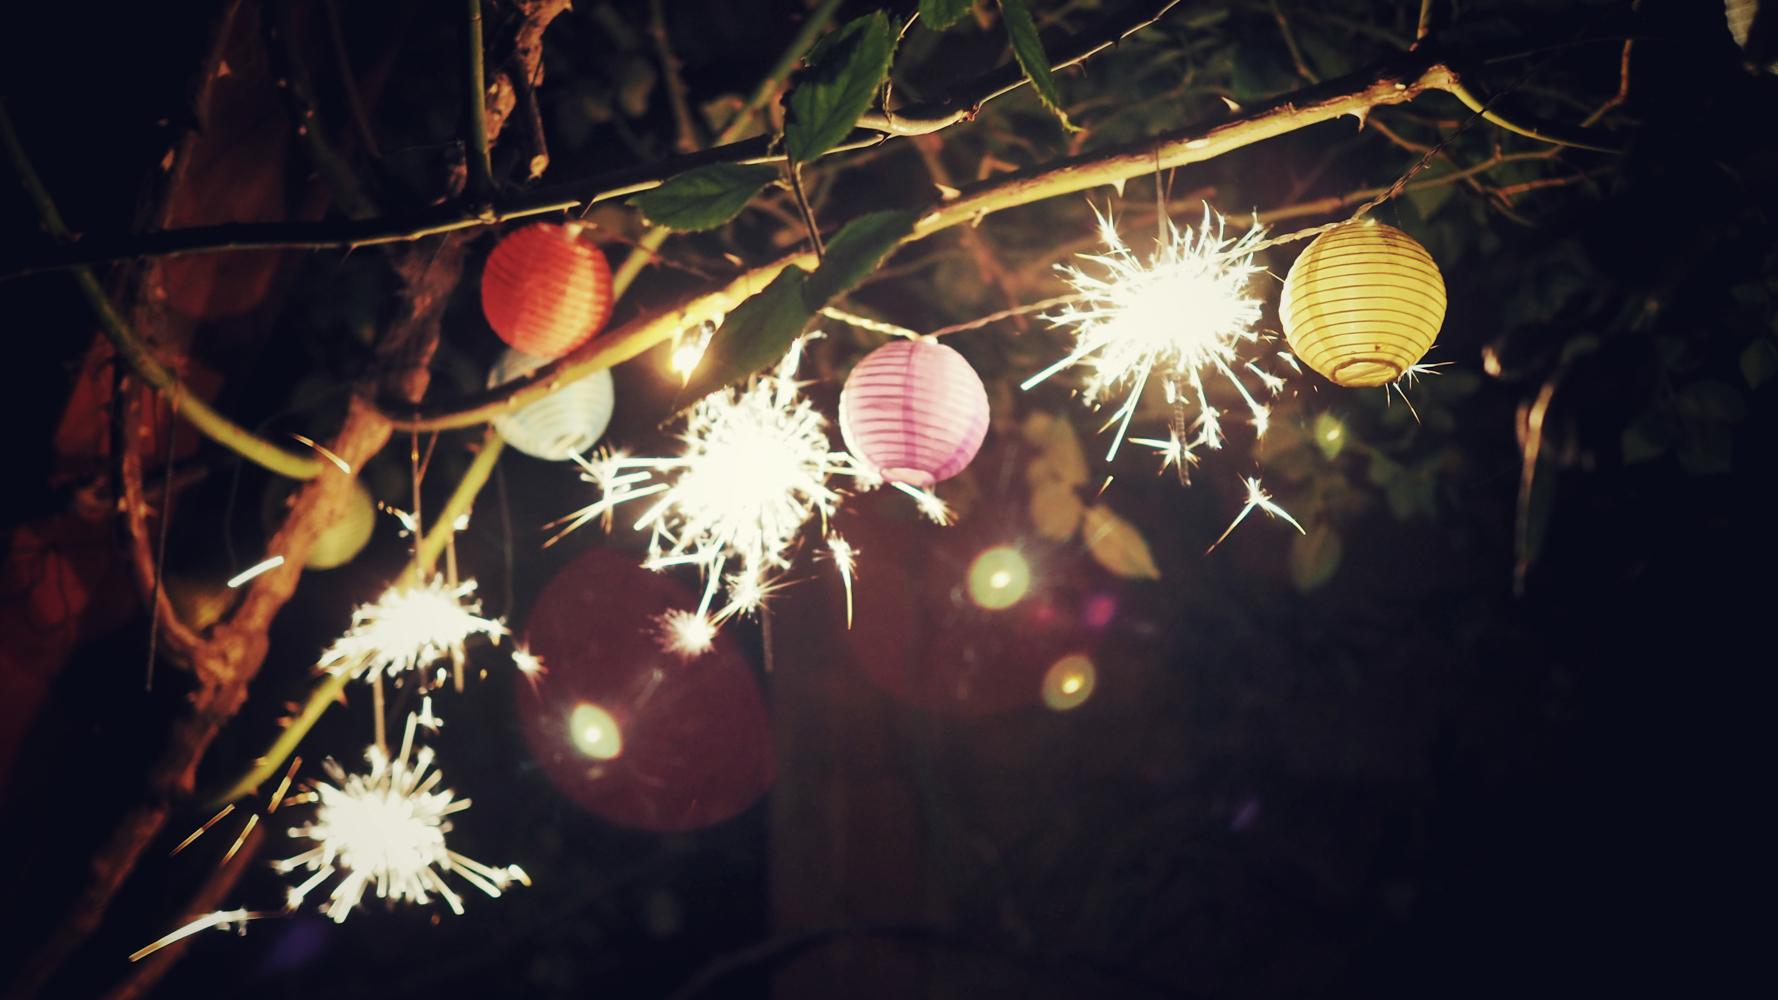 New Year lights celebration